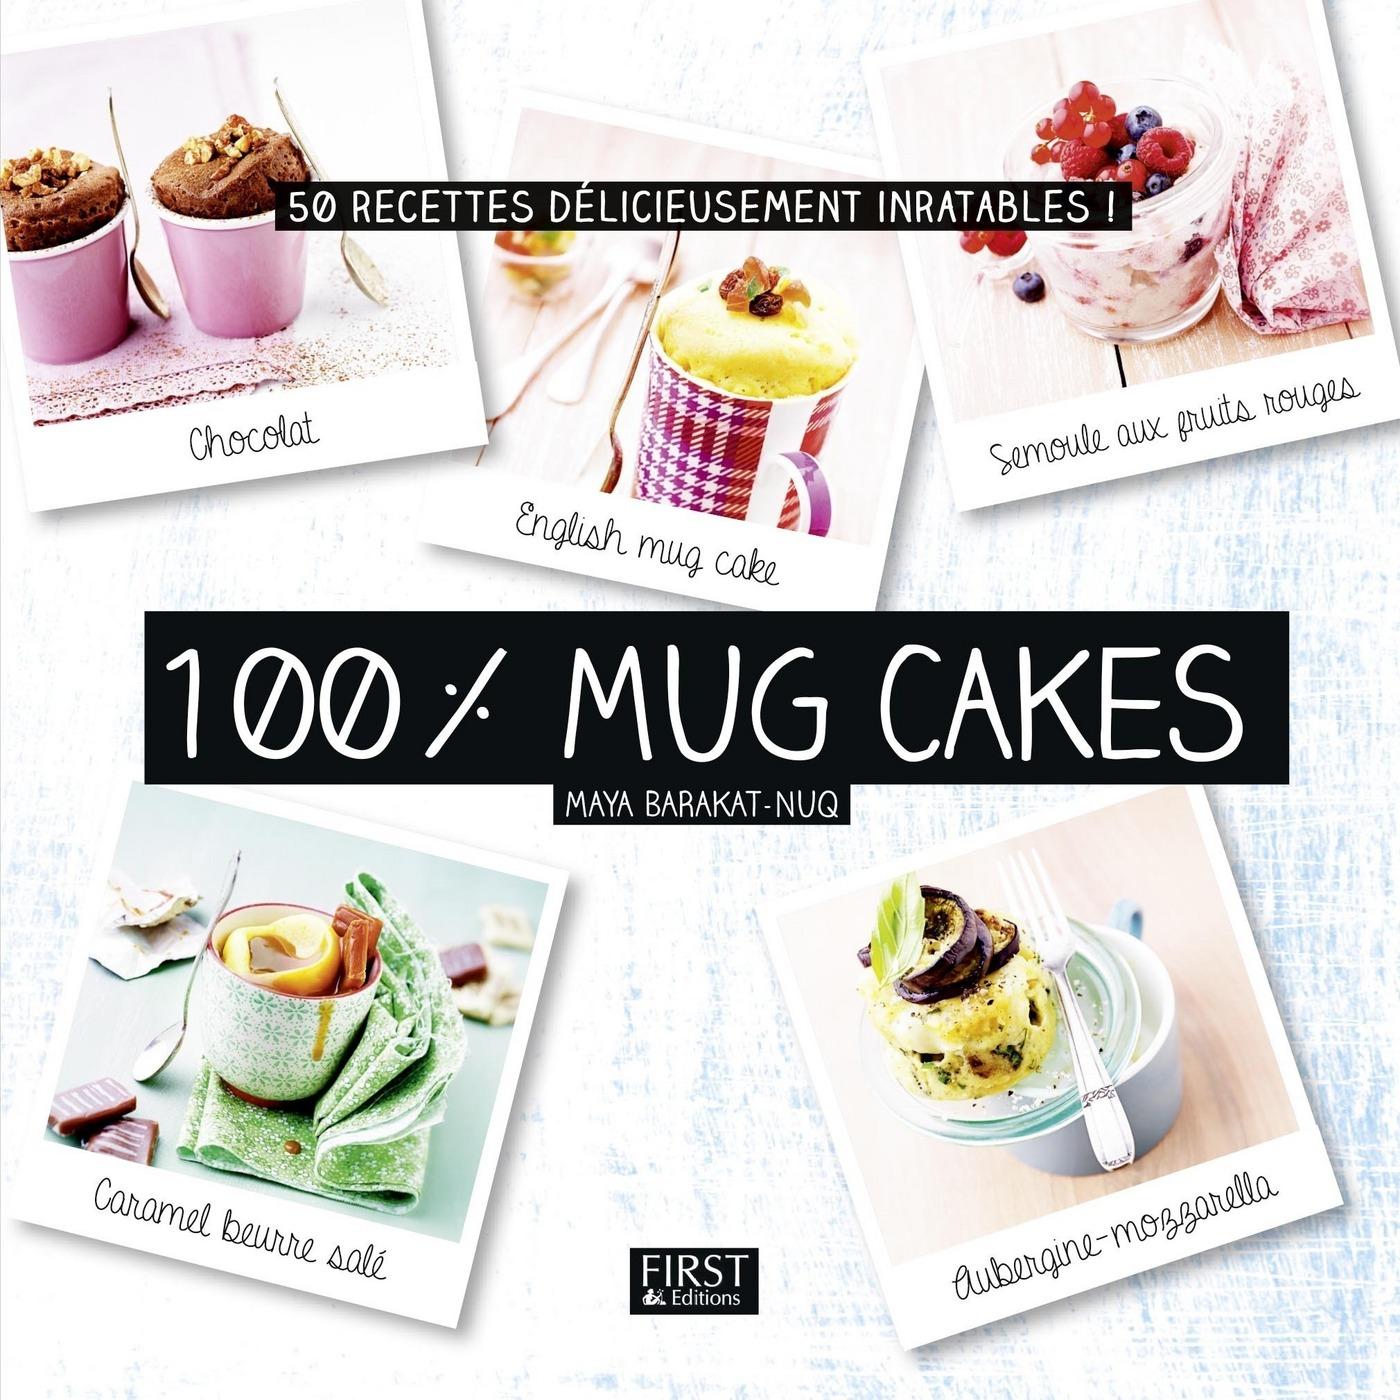 100% Mug cakes (ebook)